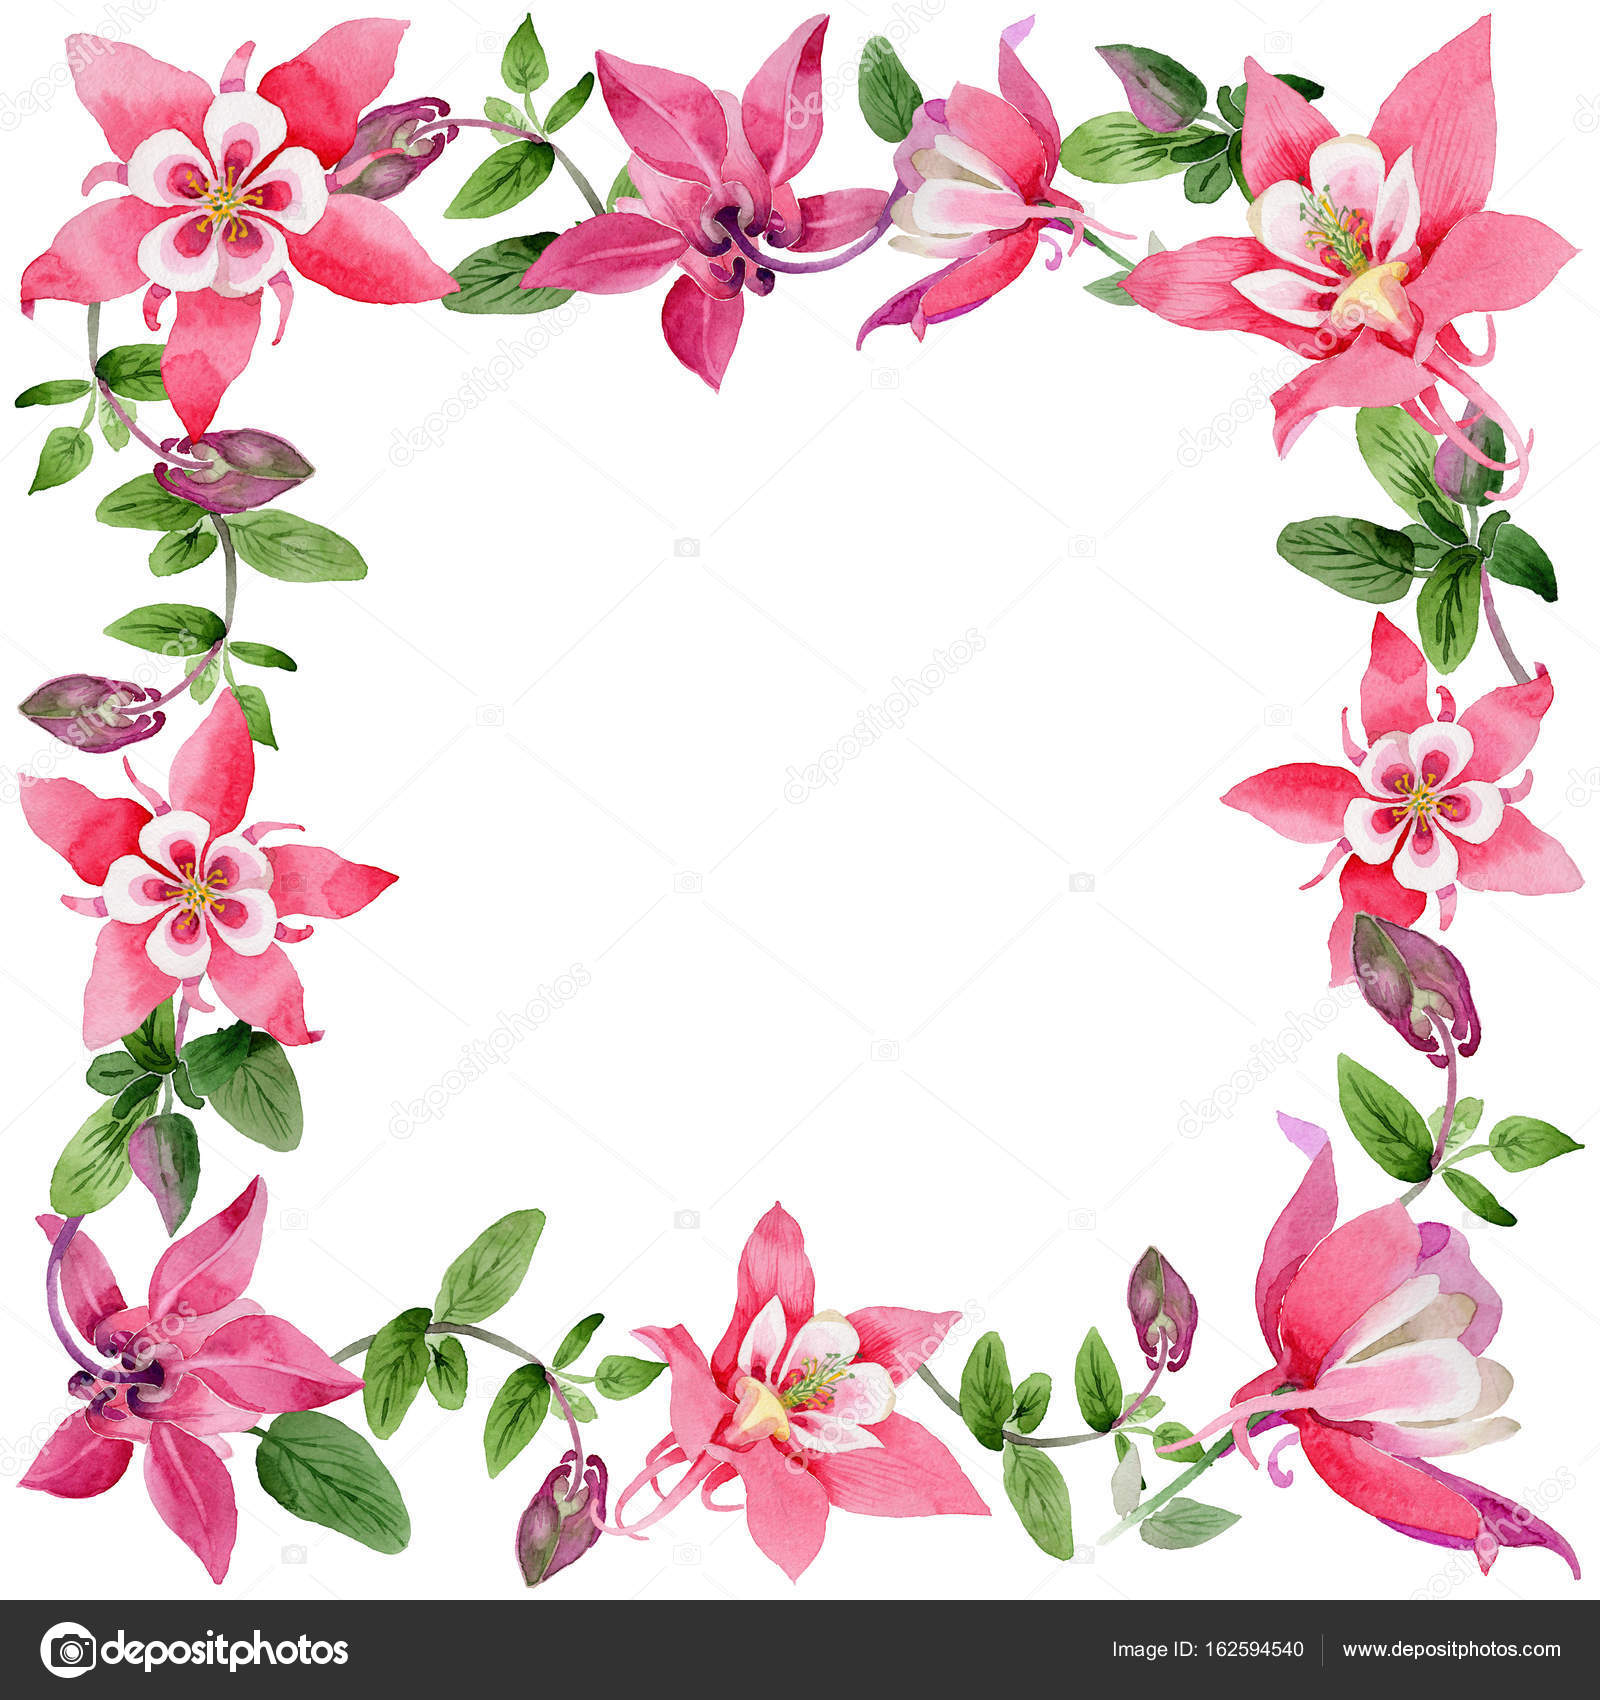 Marco de flor de aquilegia de flores silvestres en un estilo ...